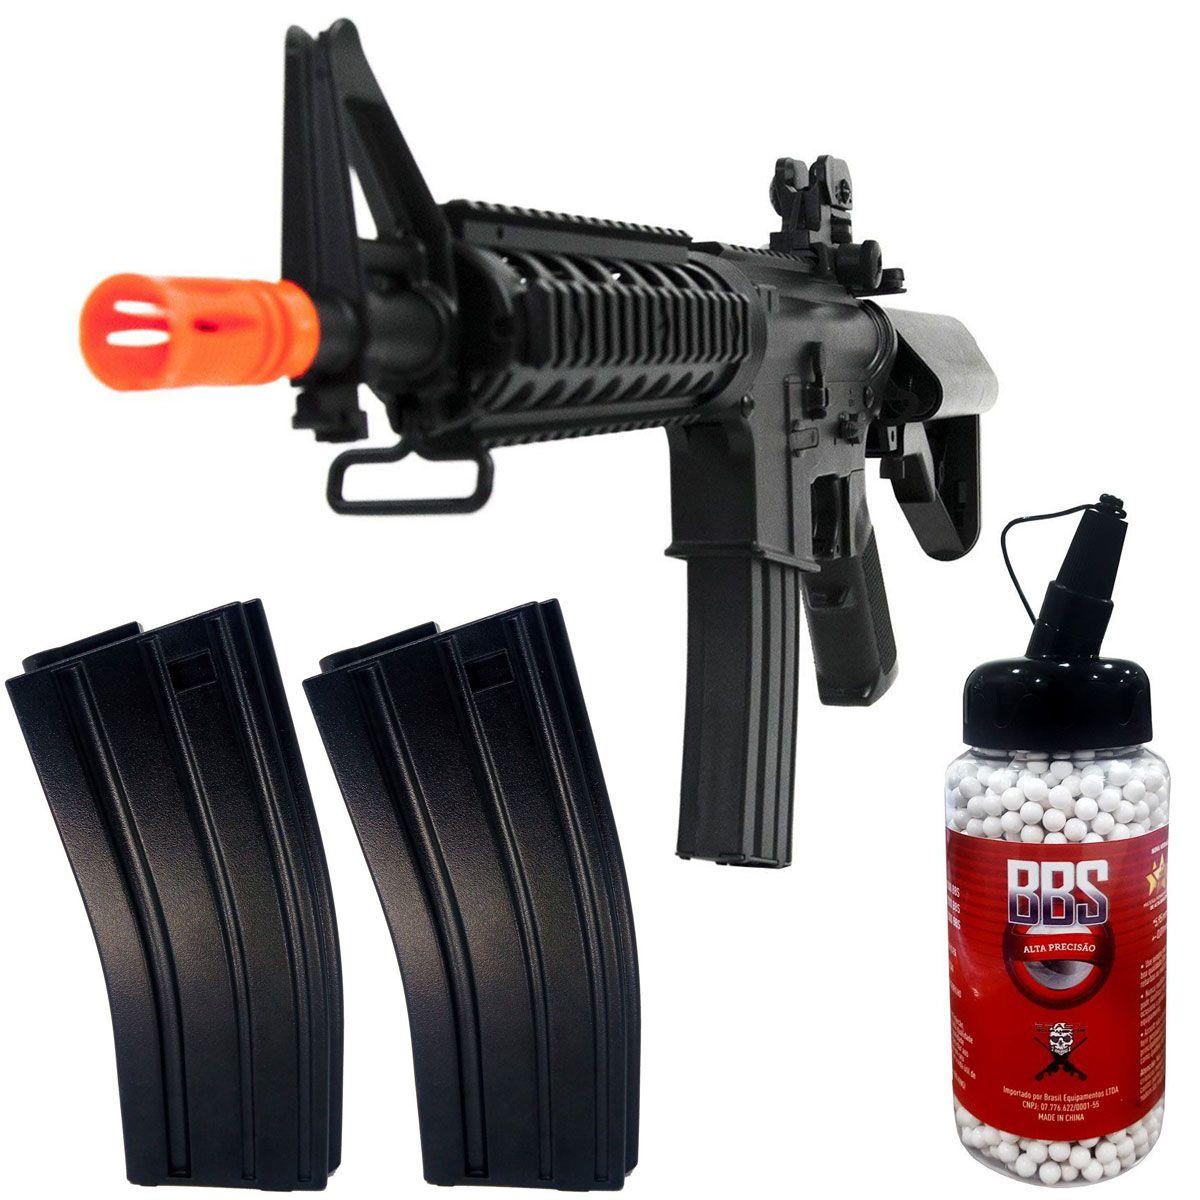 Kit Rifle Cyma + BB King 0,20g + 2 Magazine Extra